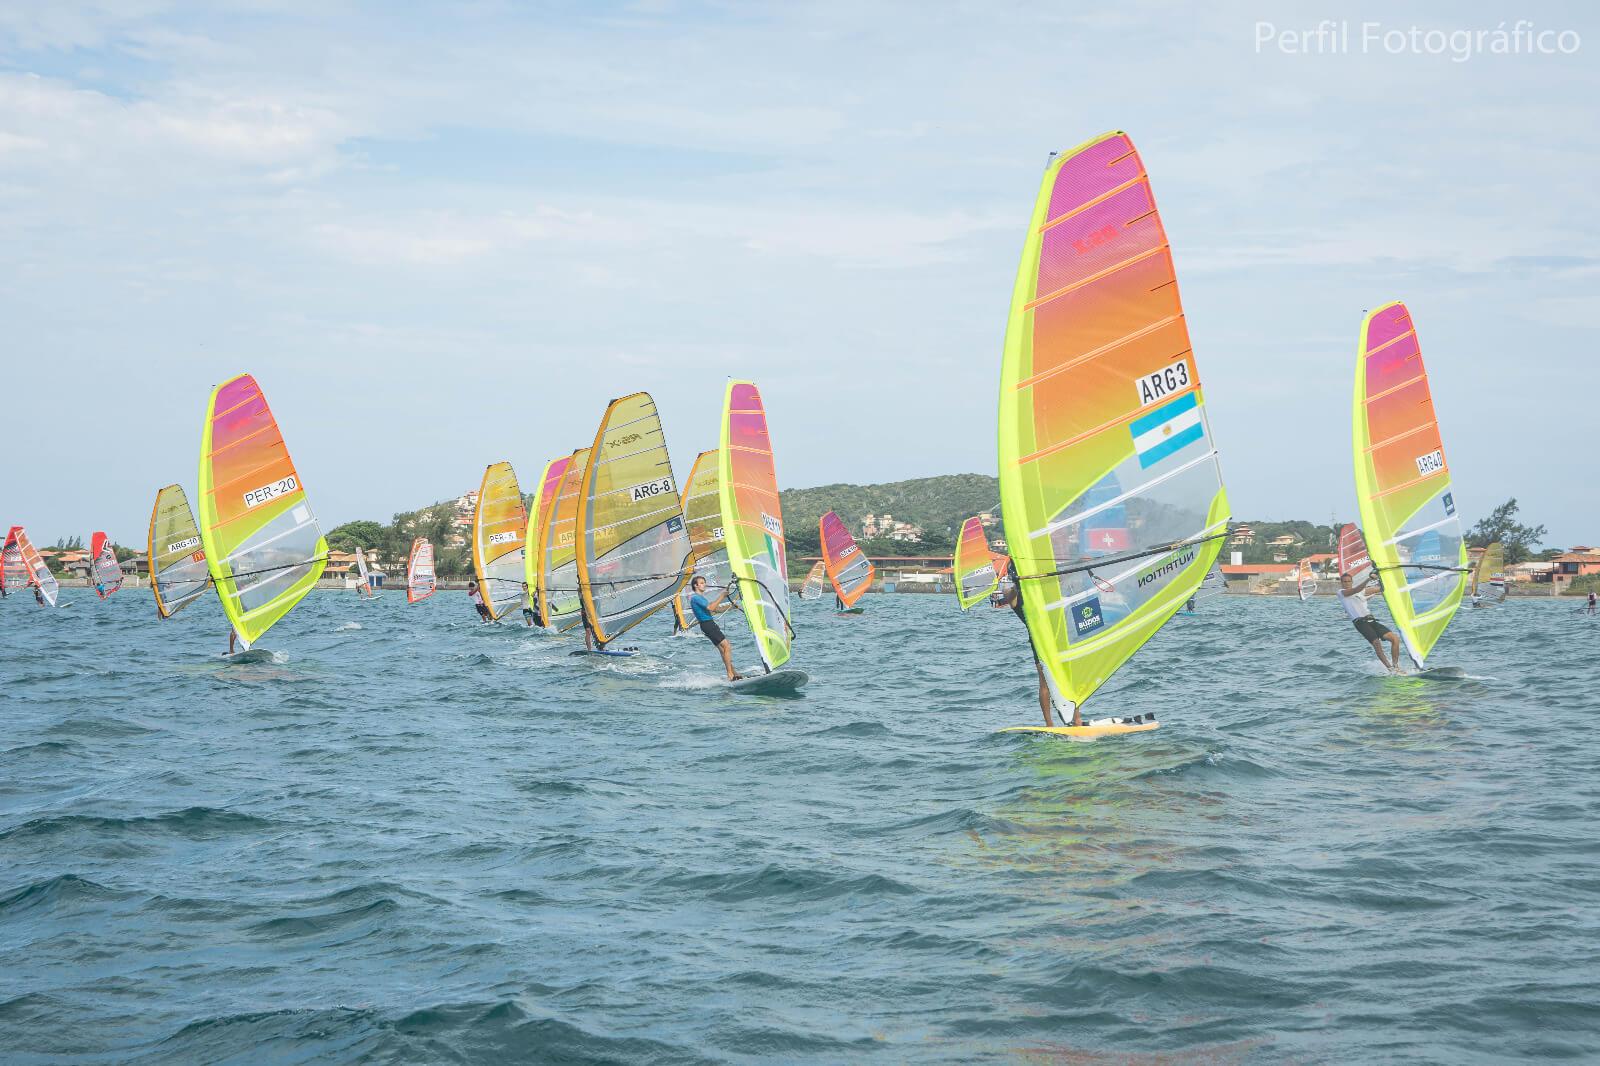 RSX - Semana olimpica de Hyeres - Francia